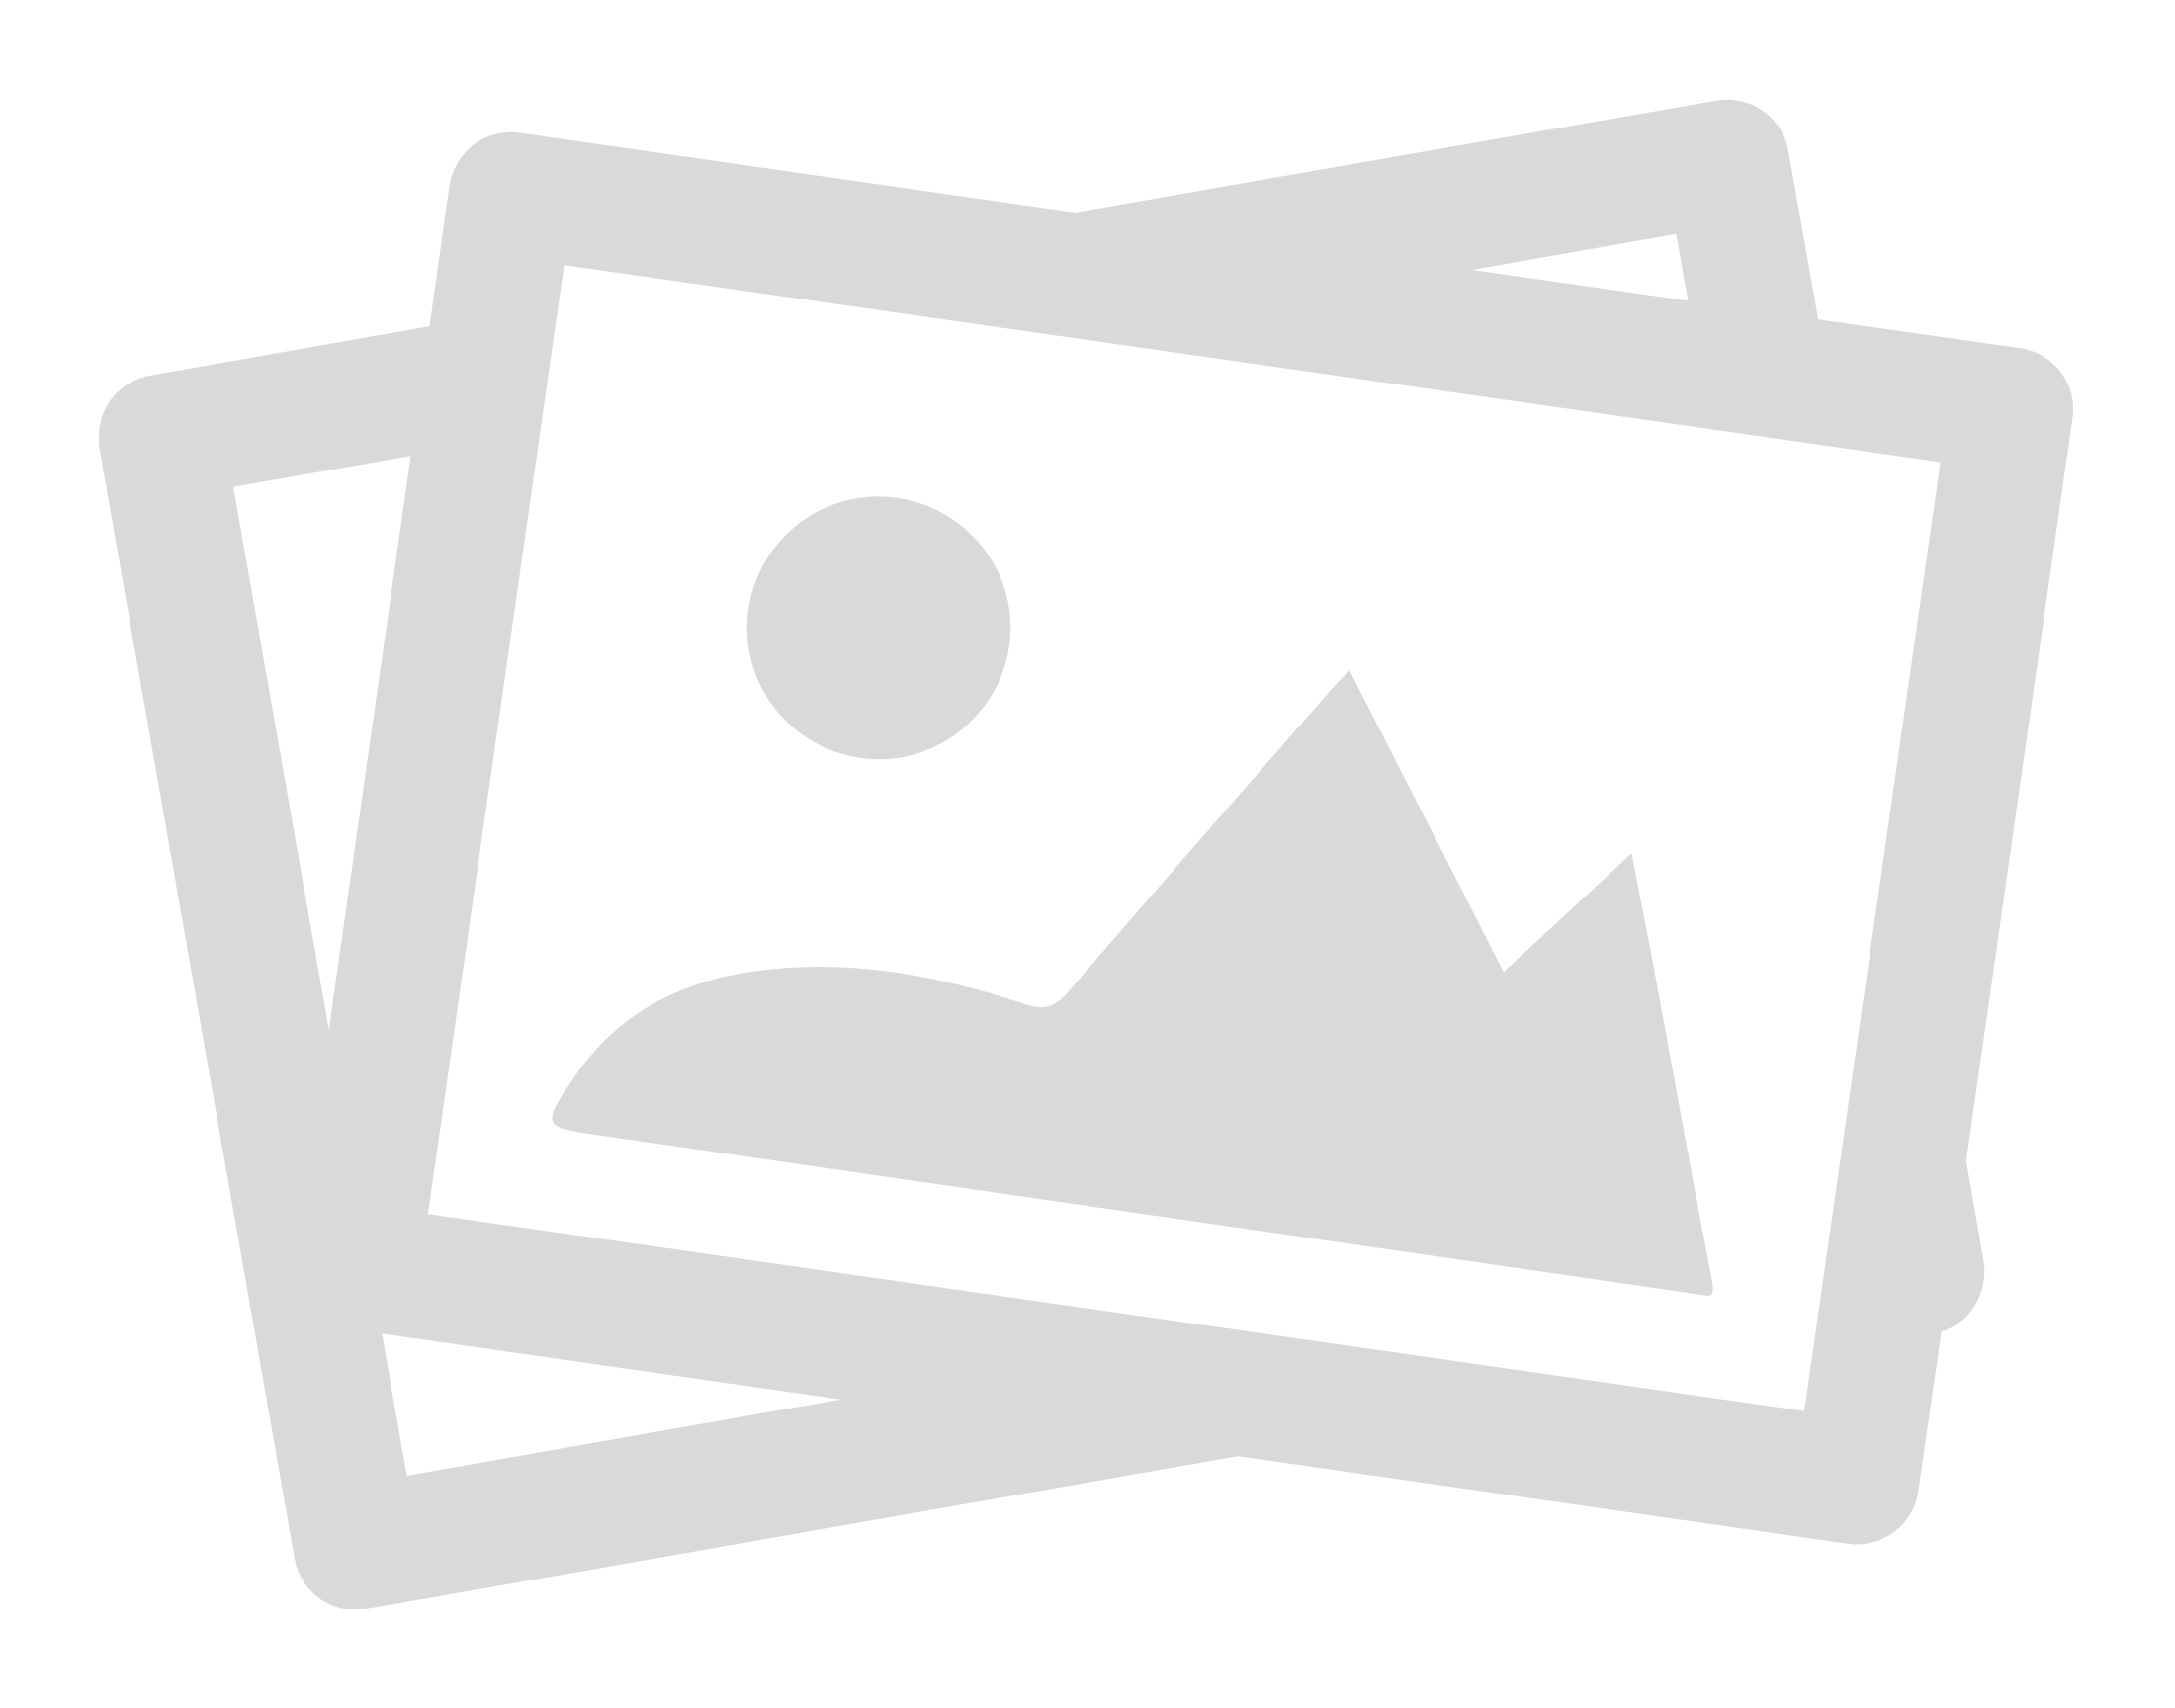 Image of   Textbook Of Removable Prosthodontics - E-bog (pdf-format) - af Johan Gunne, Percy Milleding, Asbjørn Jokstad, Flemming Isidor, Gunnar E. Carlsson, Tore Dérand, Ulf Lerner, Margareta Molin Thorén, Einar Berg, Gunilla Nordenram, Tom Bergendal, Per Stål, Bo